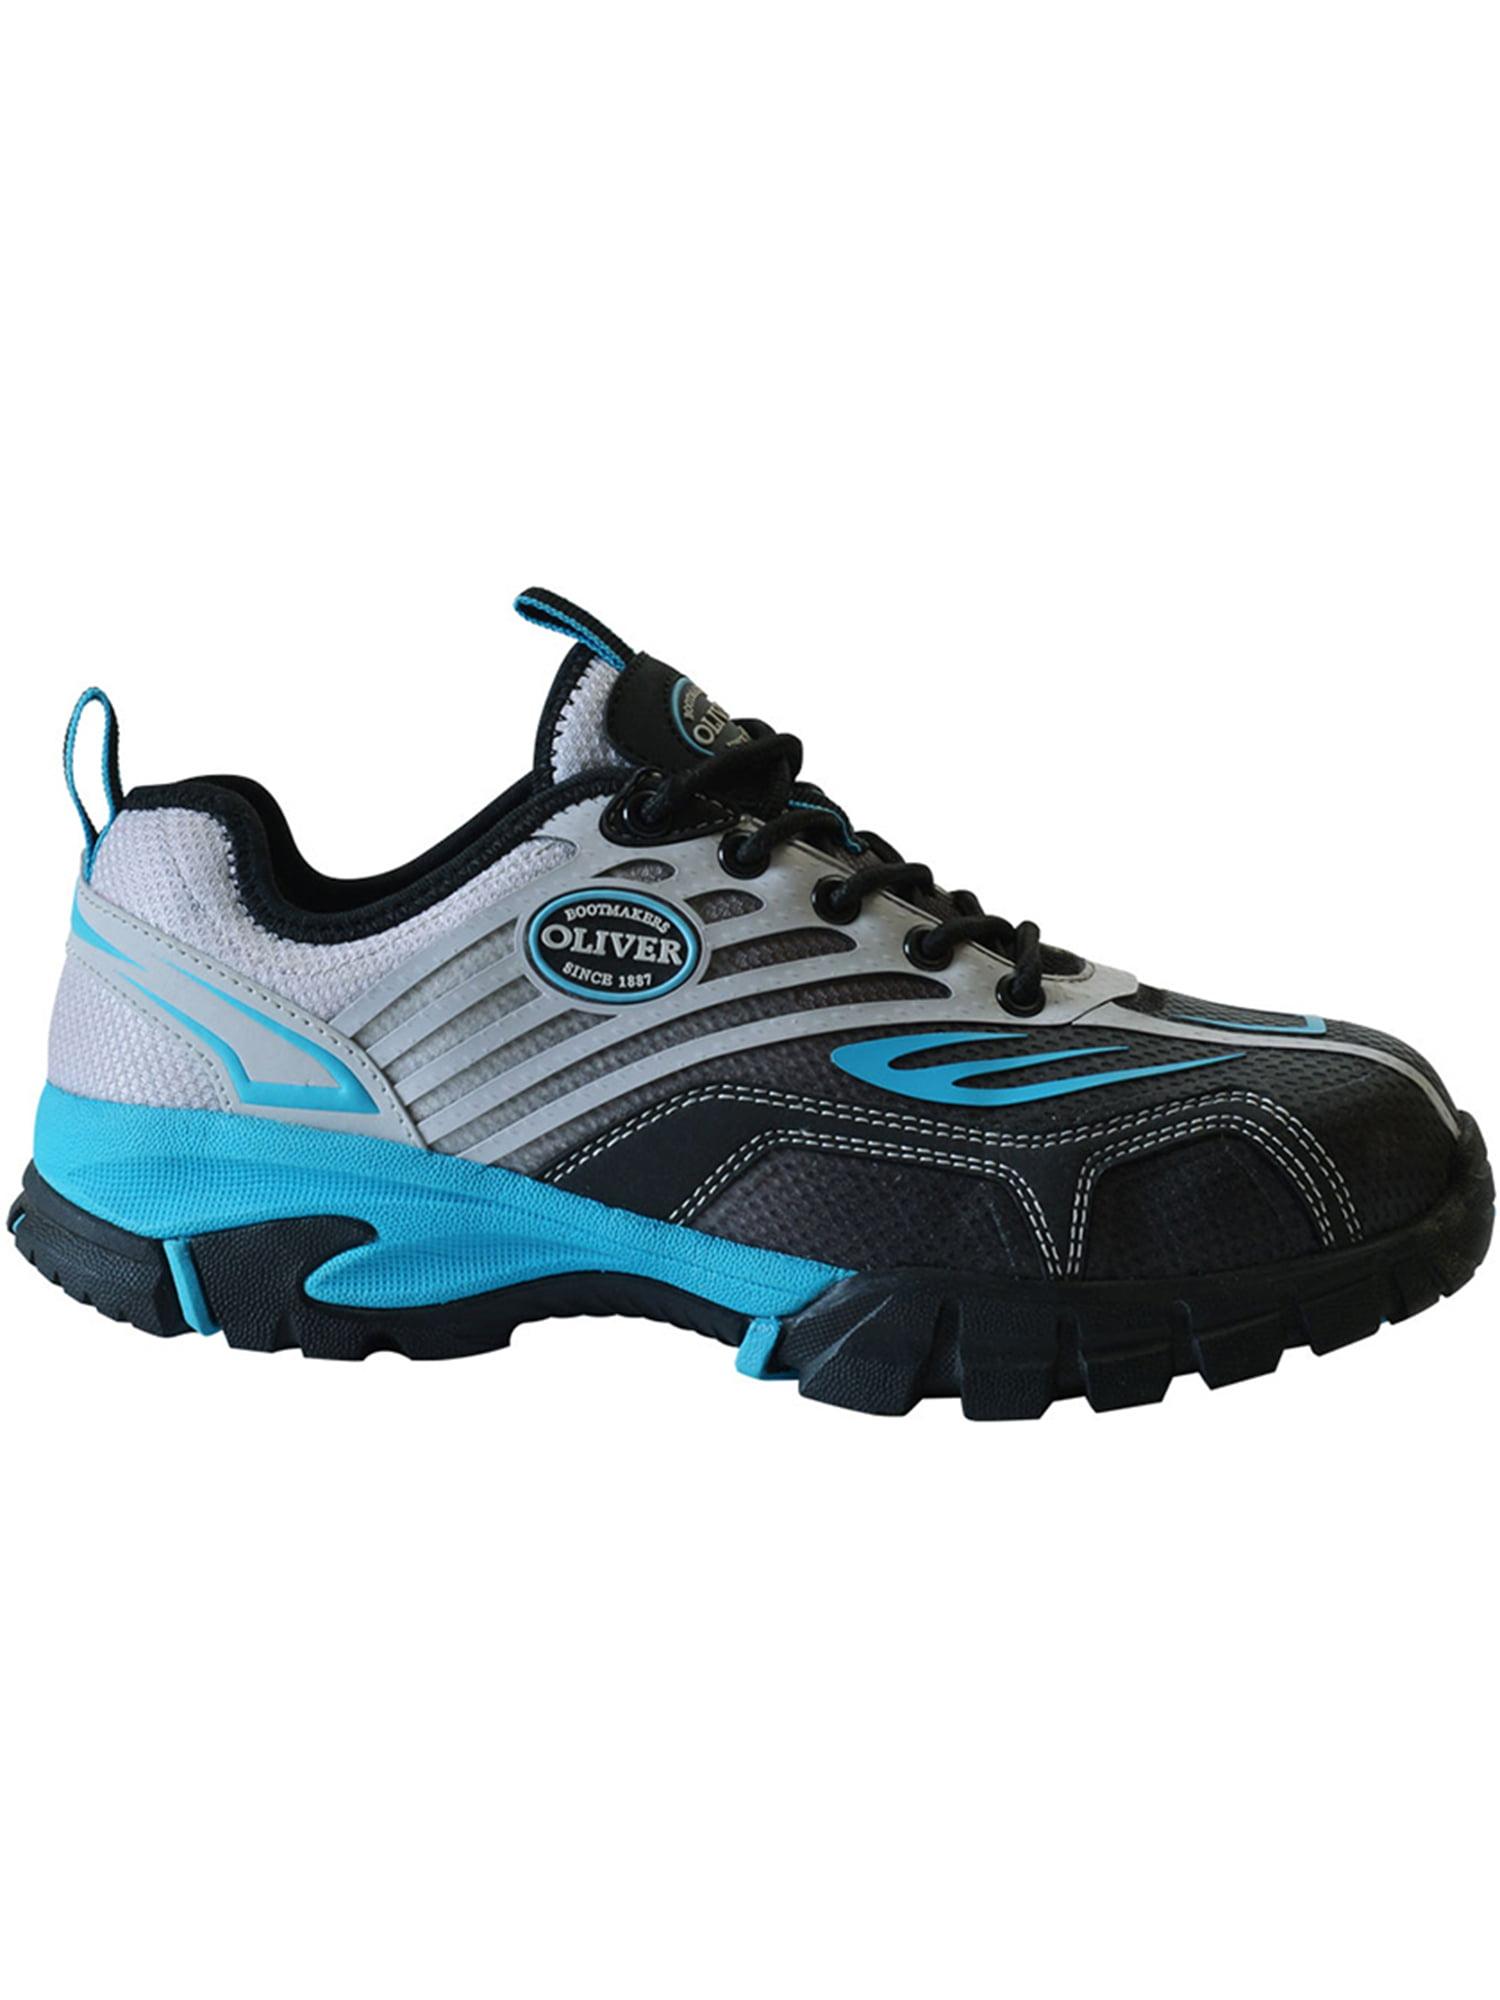 Oliver Women's 3'' Composite Toe Slip Resistant Waterproof Textile Work Sneakers Blue Mesh Textile Waterproof EVA Rubber 9 M 6ca0f9